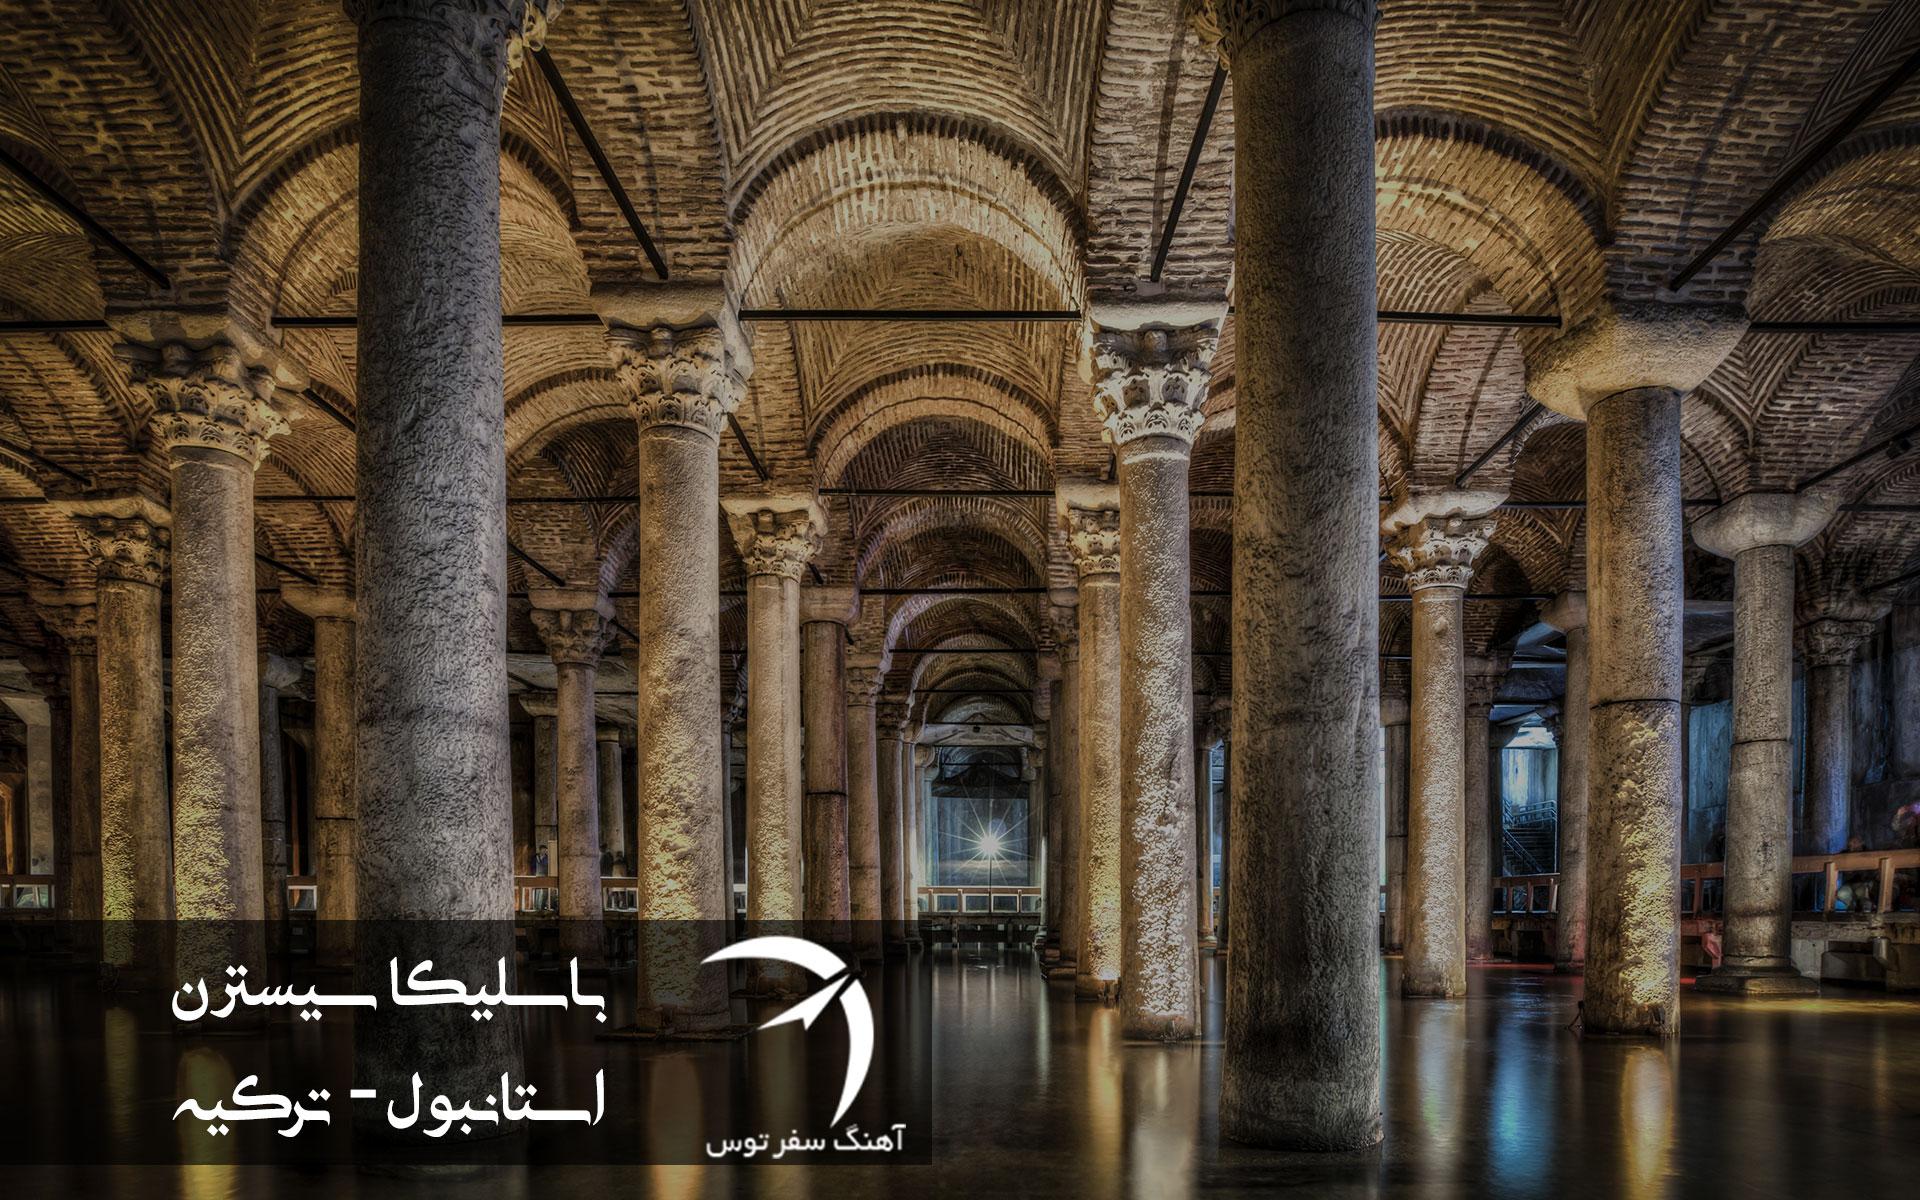 باسیلیکا سیسترن ( Basilica Cistern )